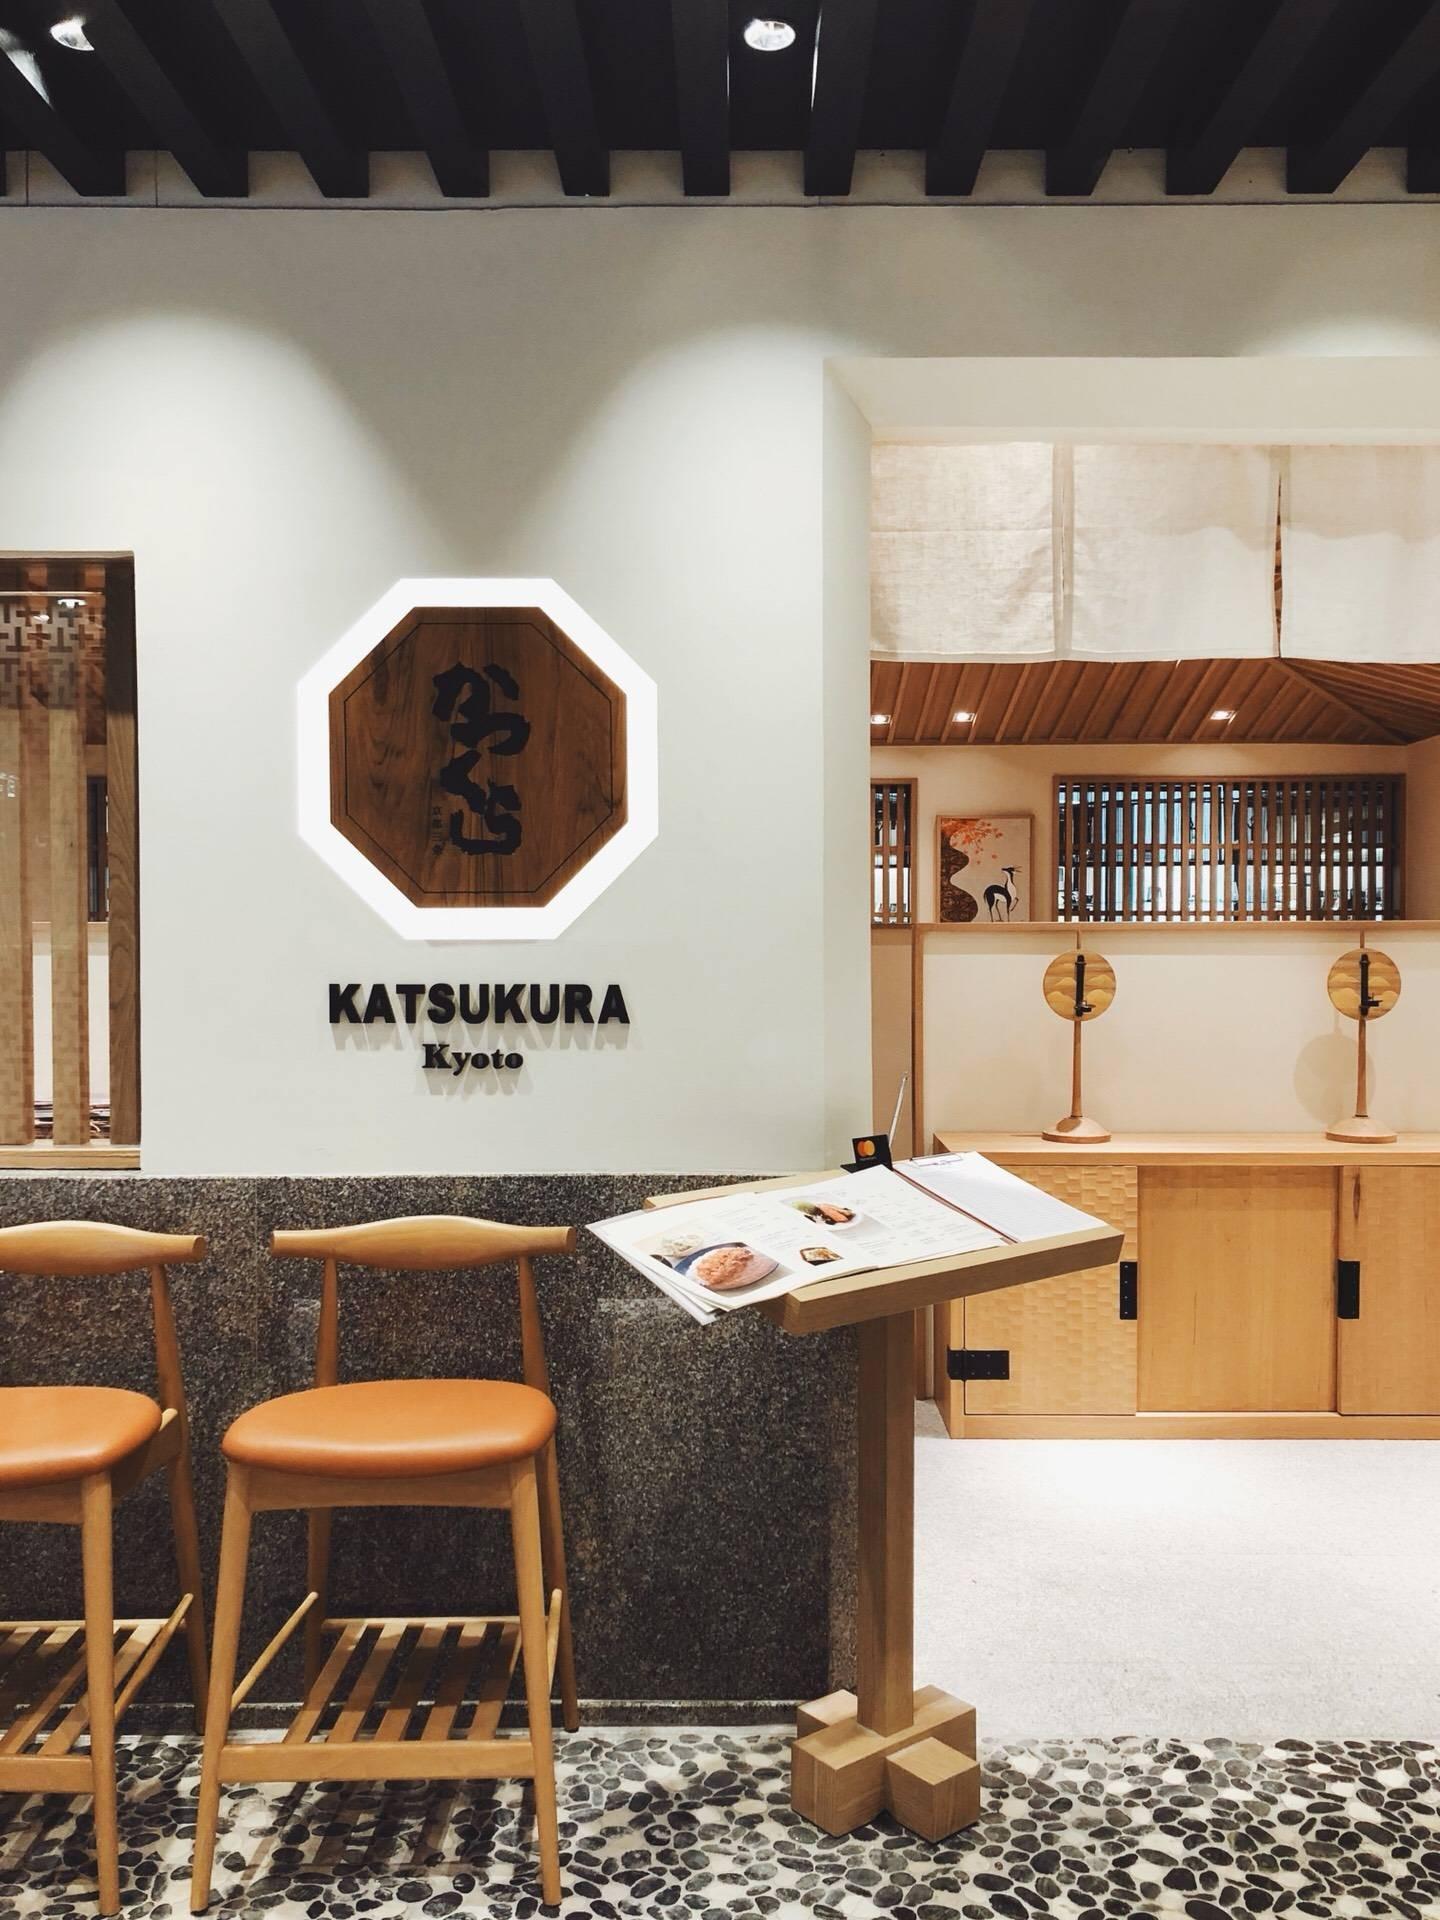 Katsukura ICONSIAM